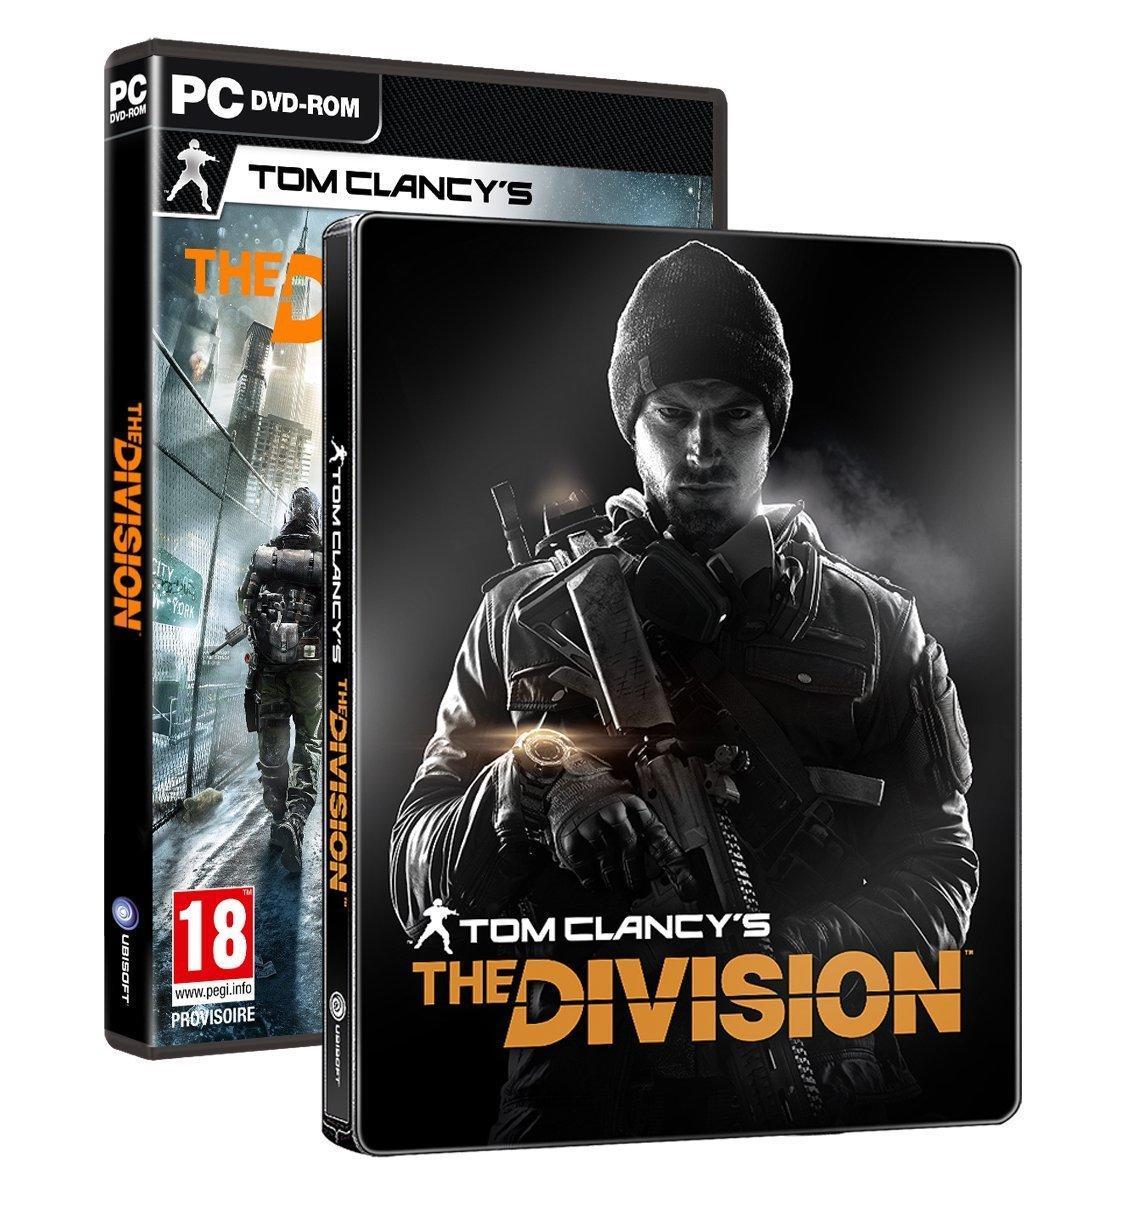 The Division + Steelbook sur PC